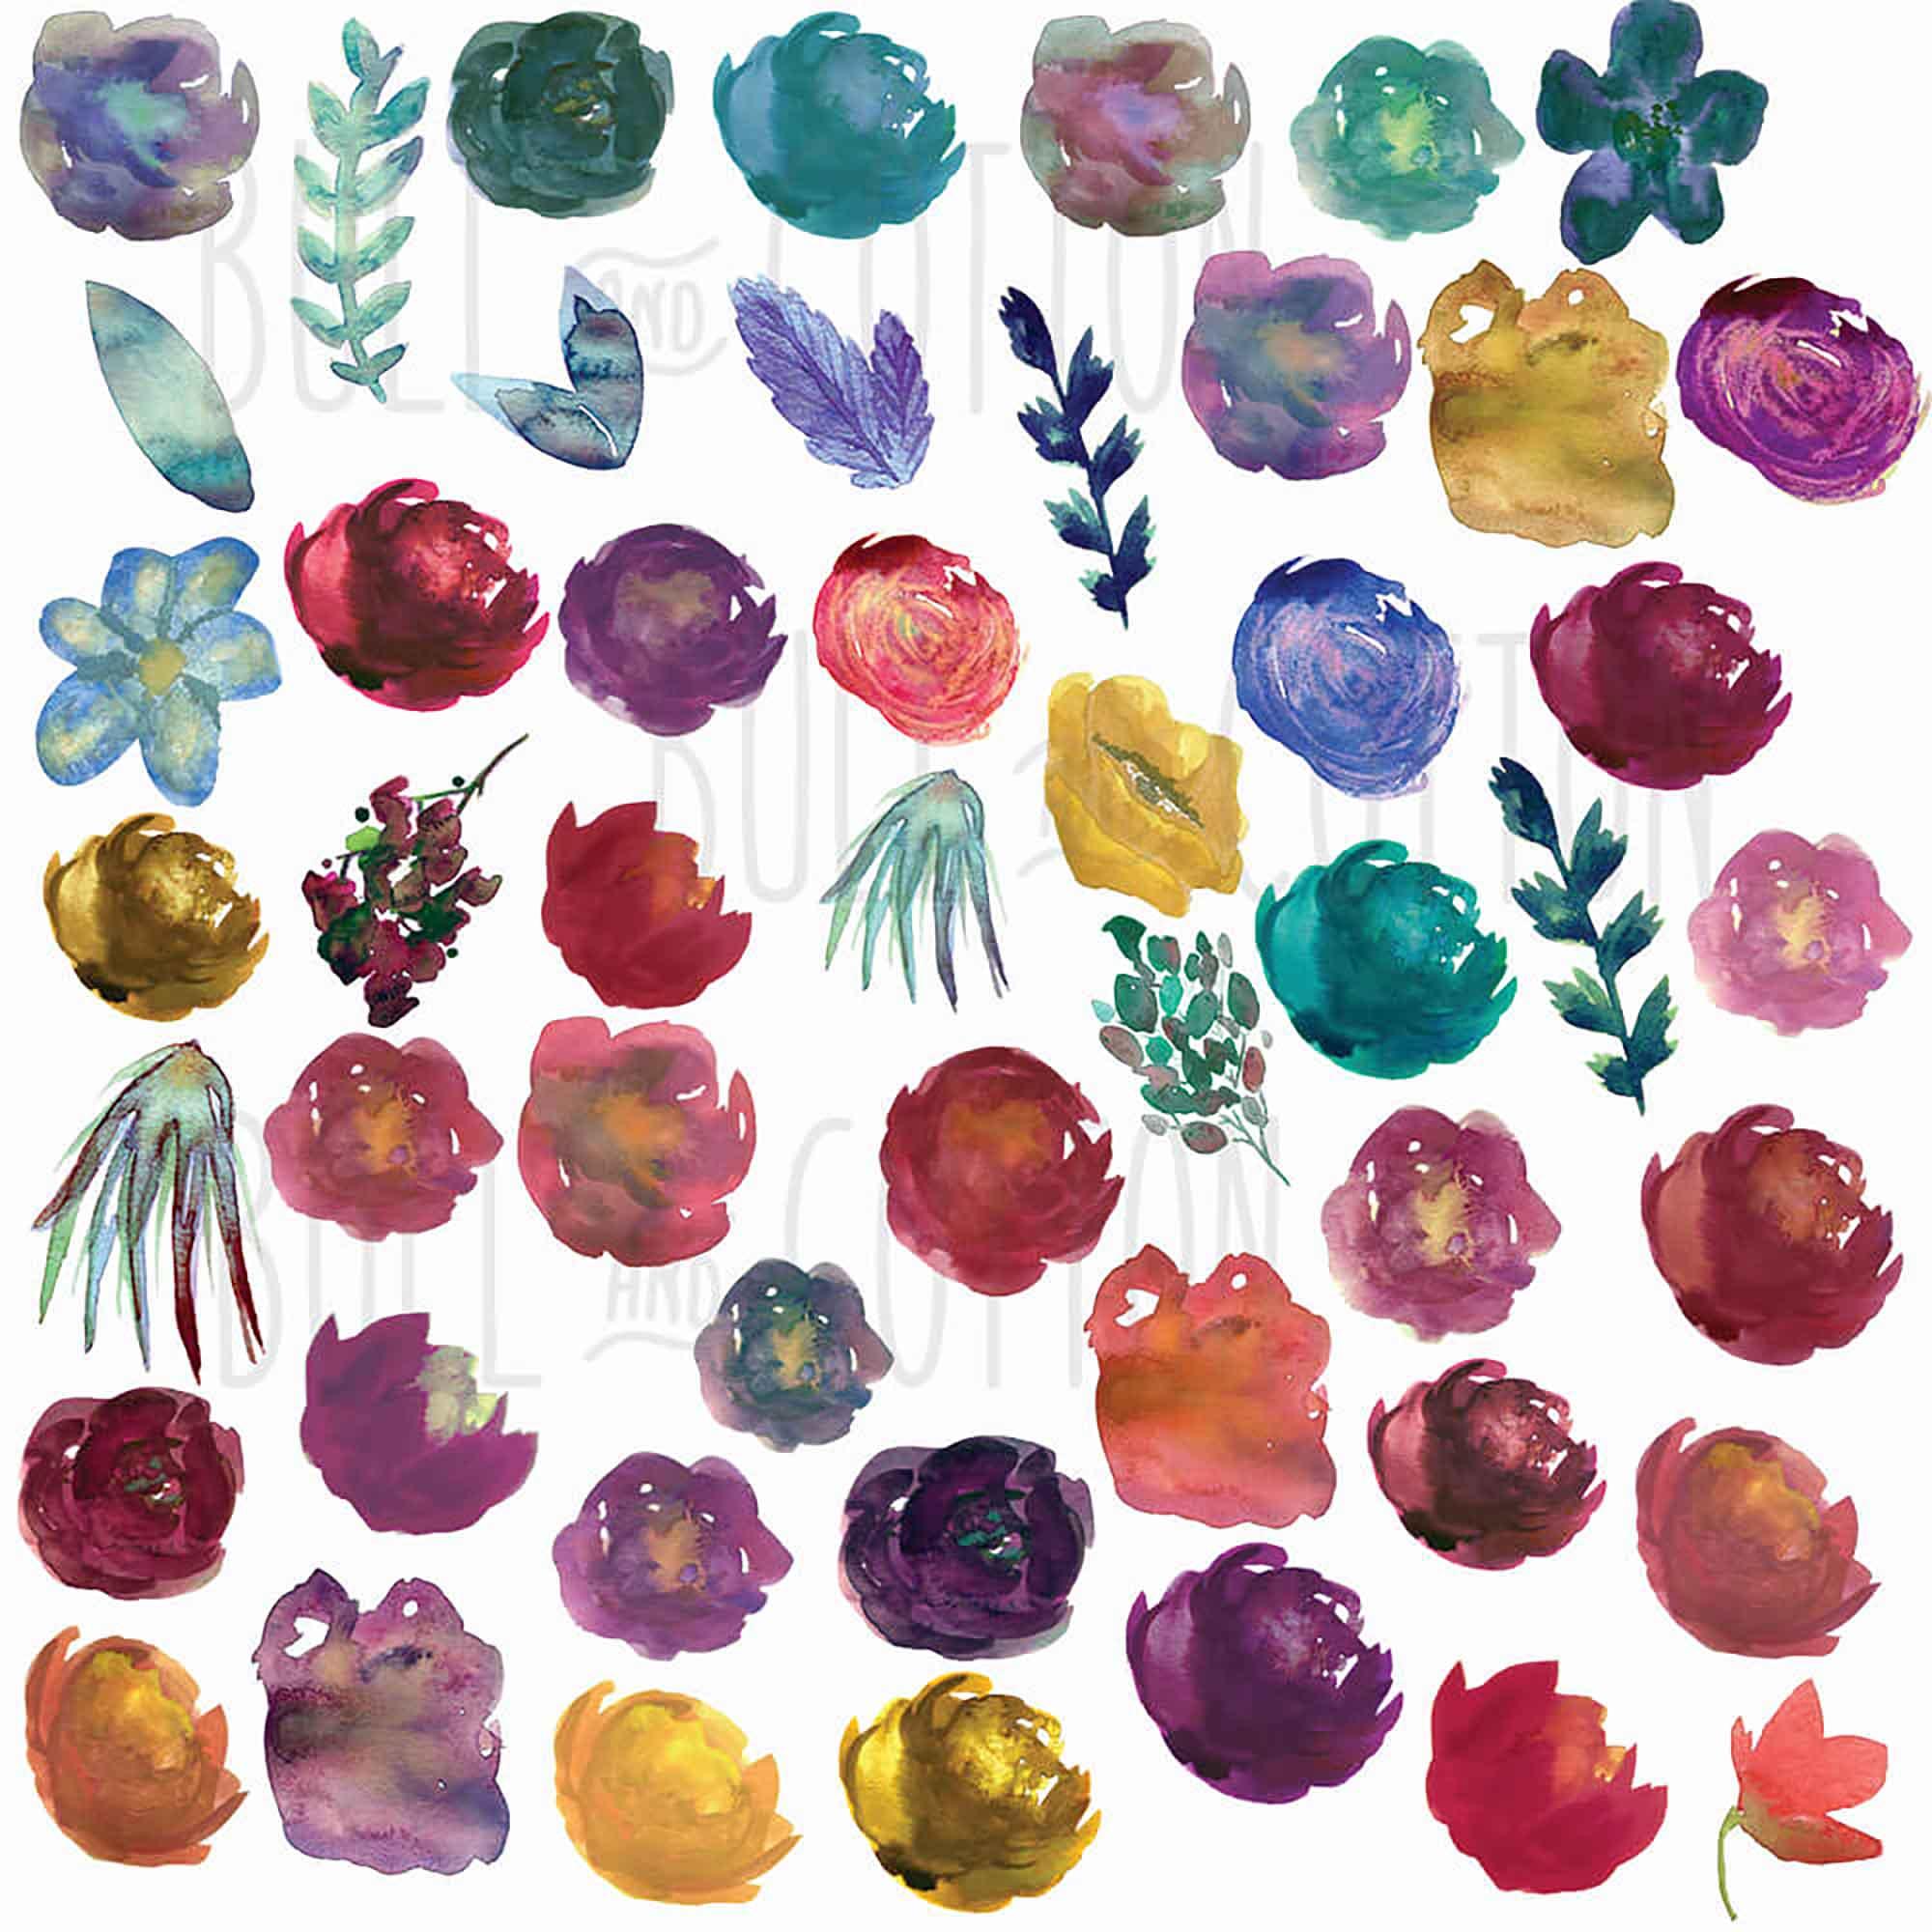 Vibrant Wildflower Design Elements 2